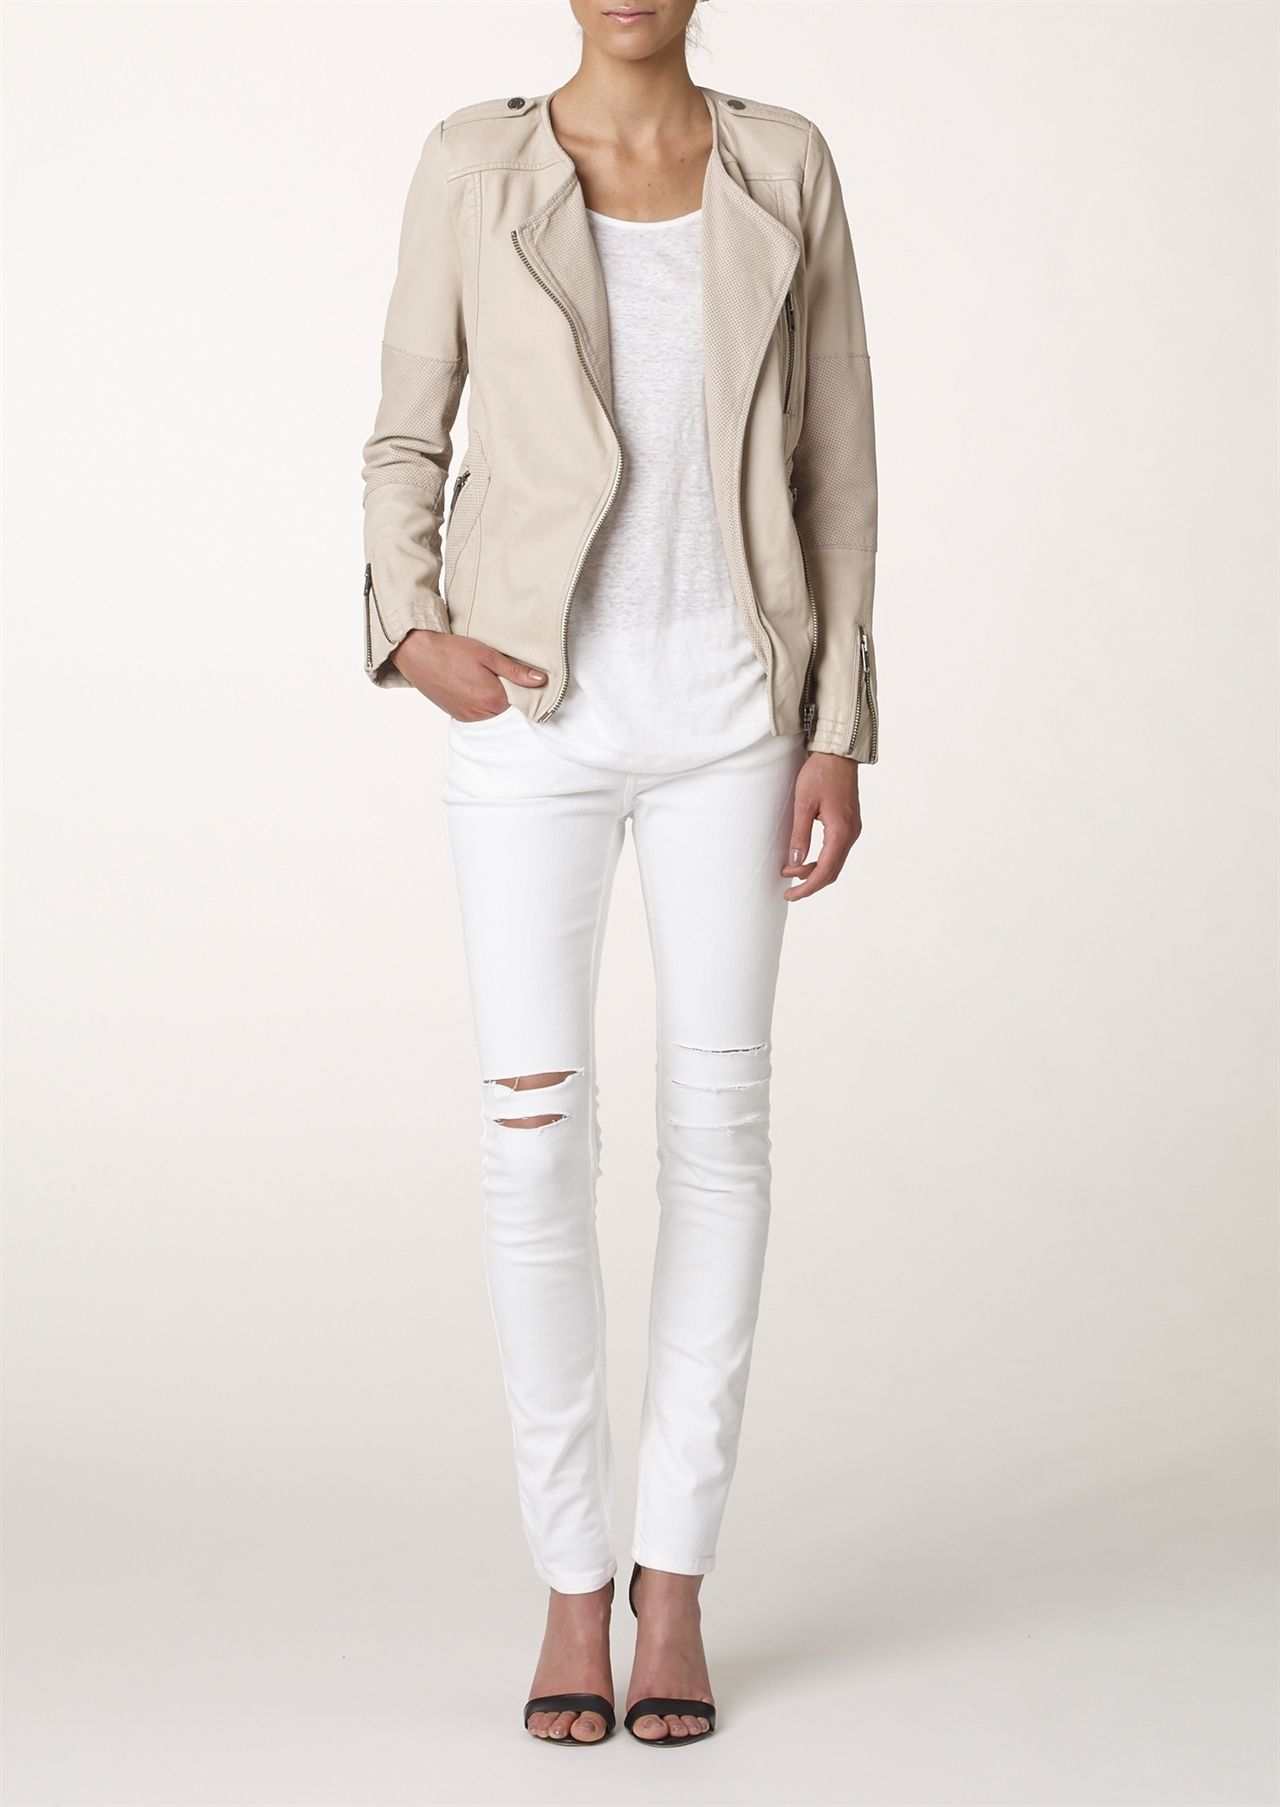 Twist & Tango | Josephine Leather Jacket - Nude | great looks ...